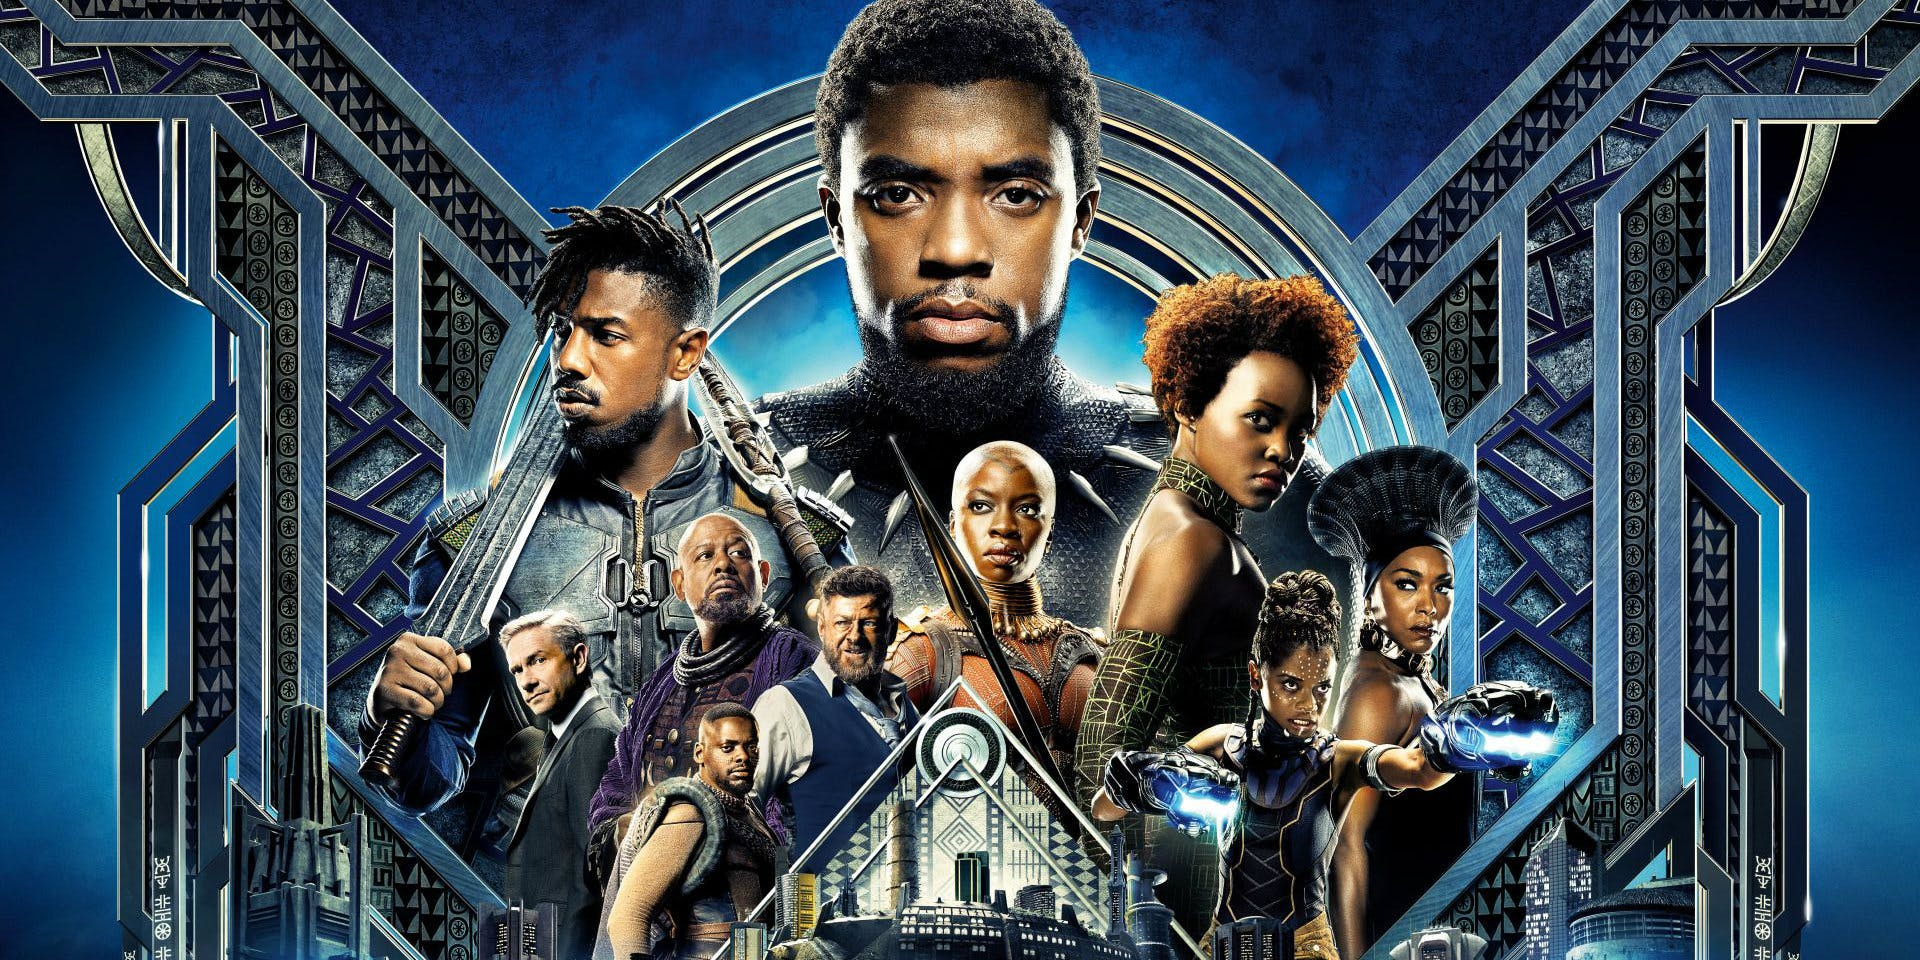 black-panther-movie-characters.jpg